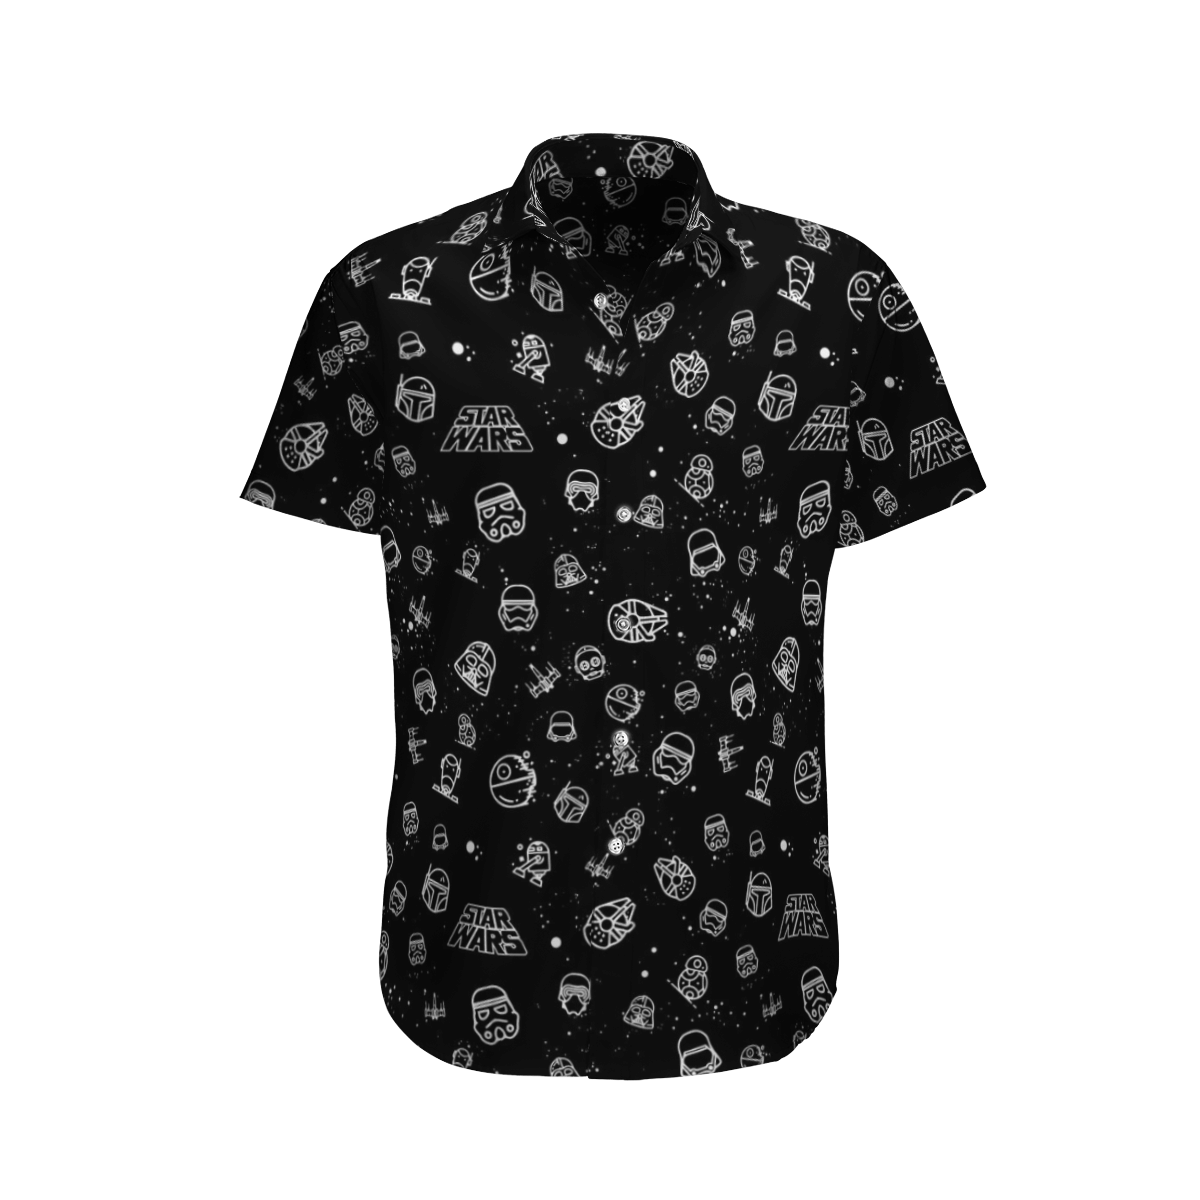 Star wars Heads All in one Black Hawaiian Shirt